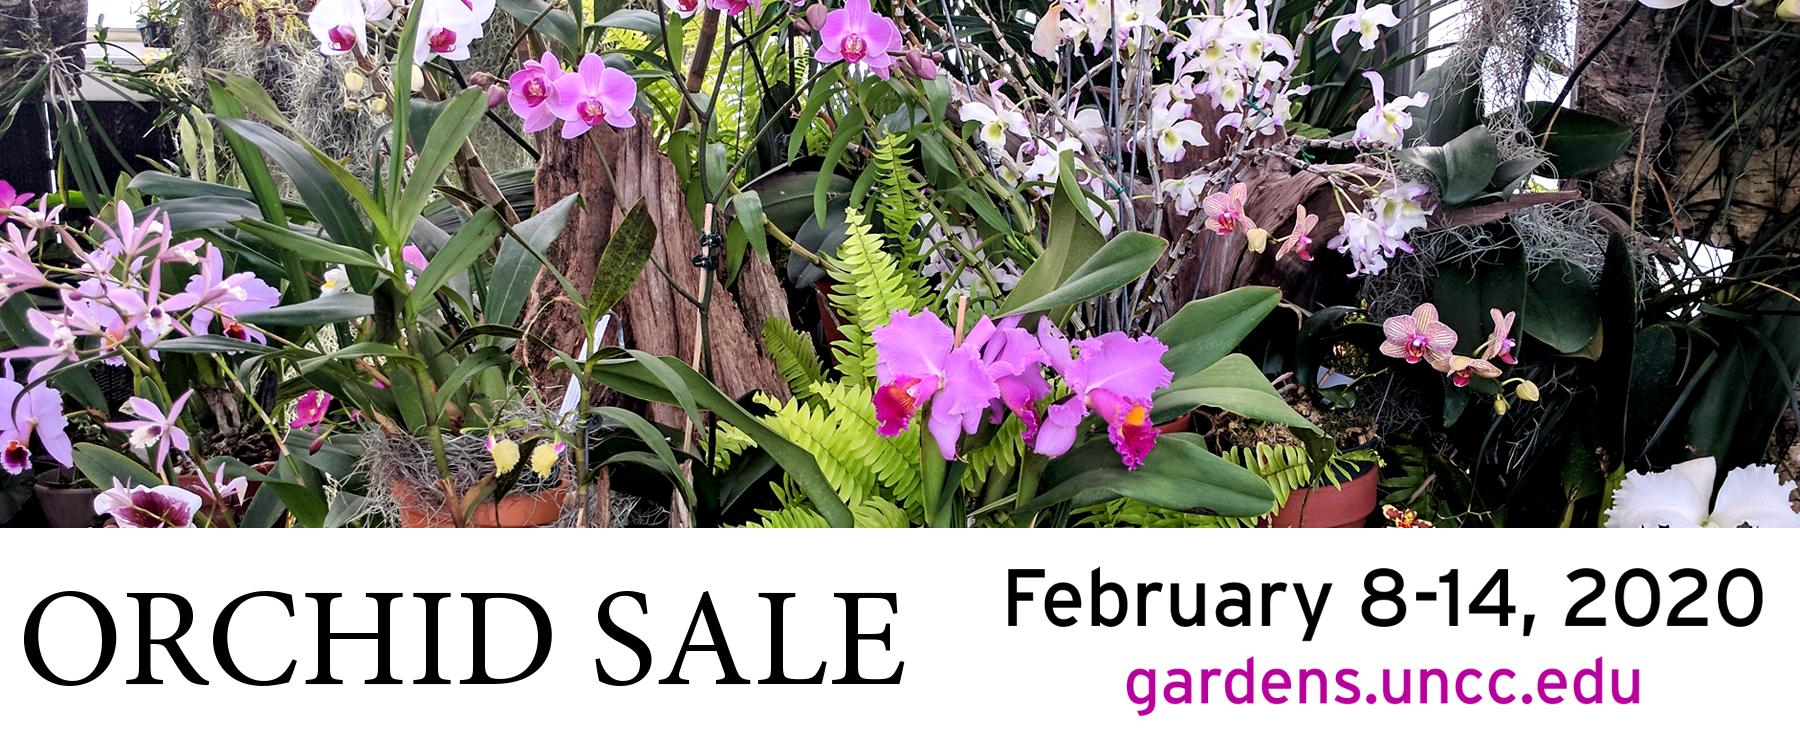 orchid sale banner